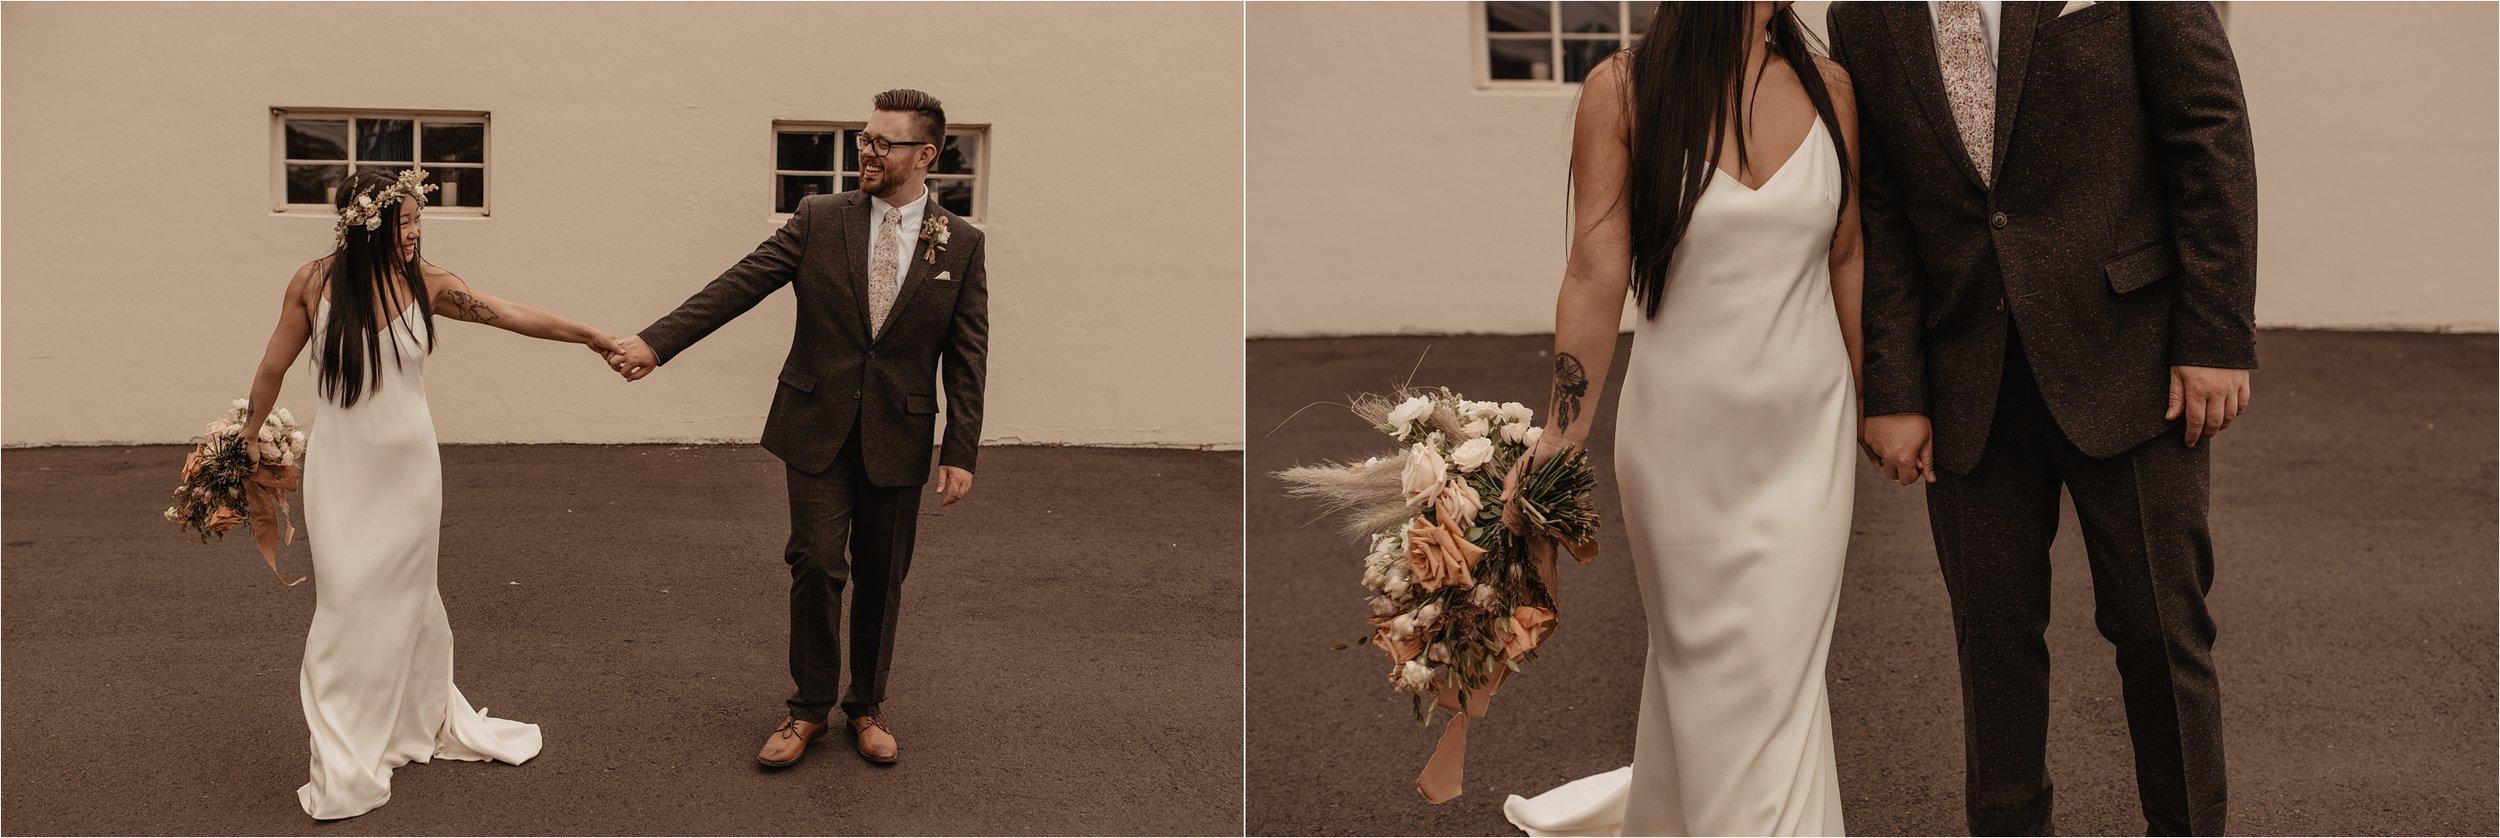 intimate-portland-modern-trendy-wedding_0029.jpg